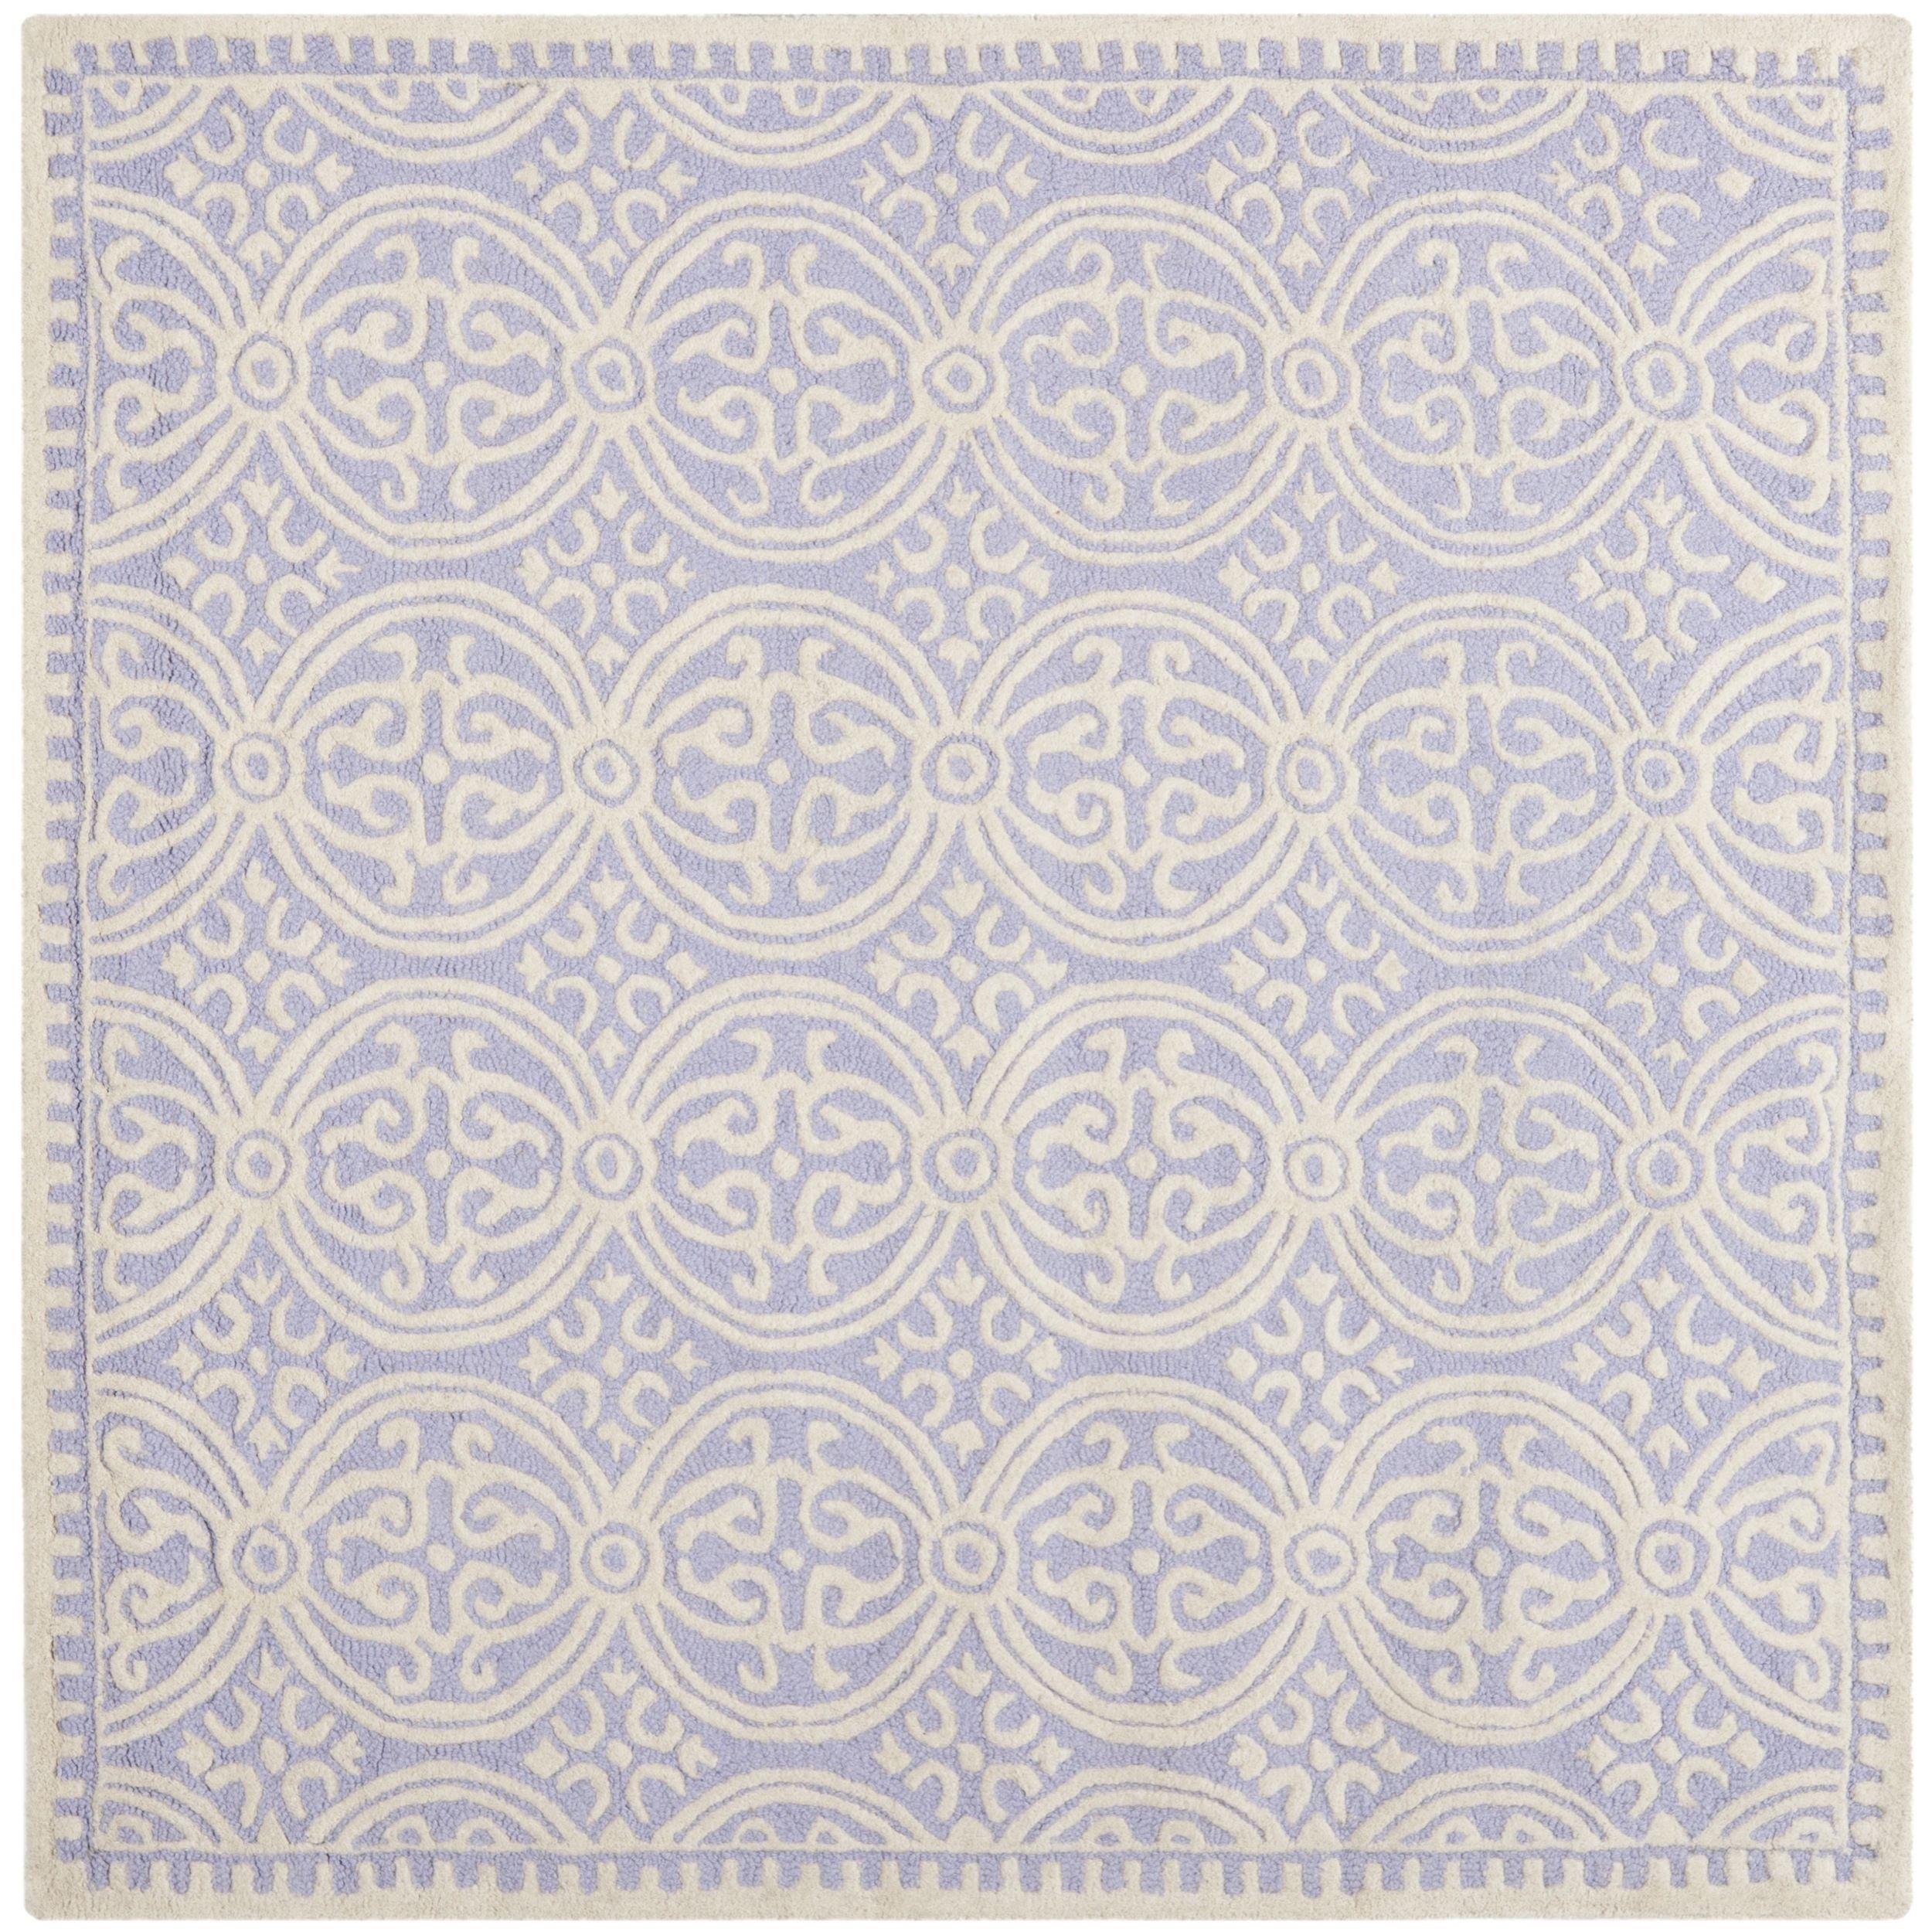 Safavieh Handmade Cambridge Moroccan Lavender/ Ivory Rug